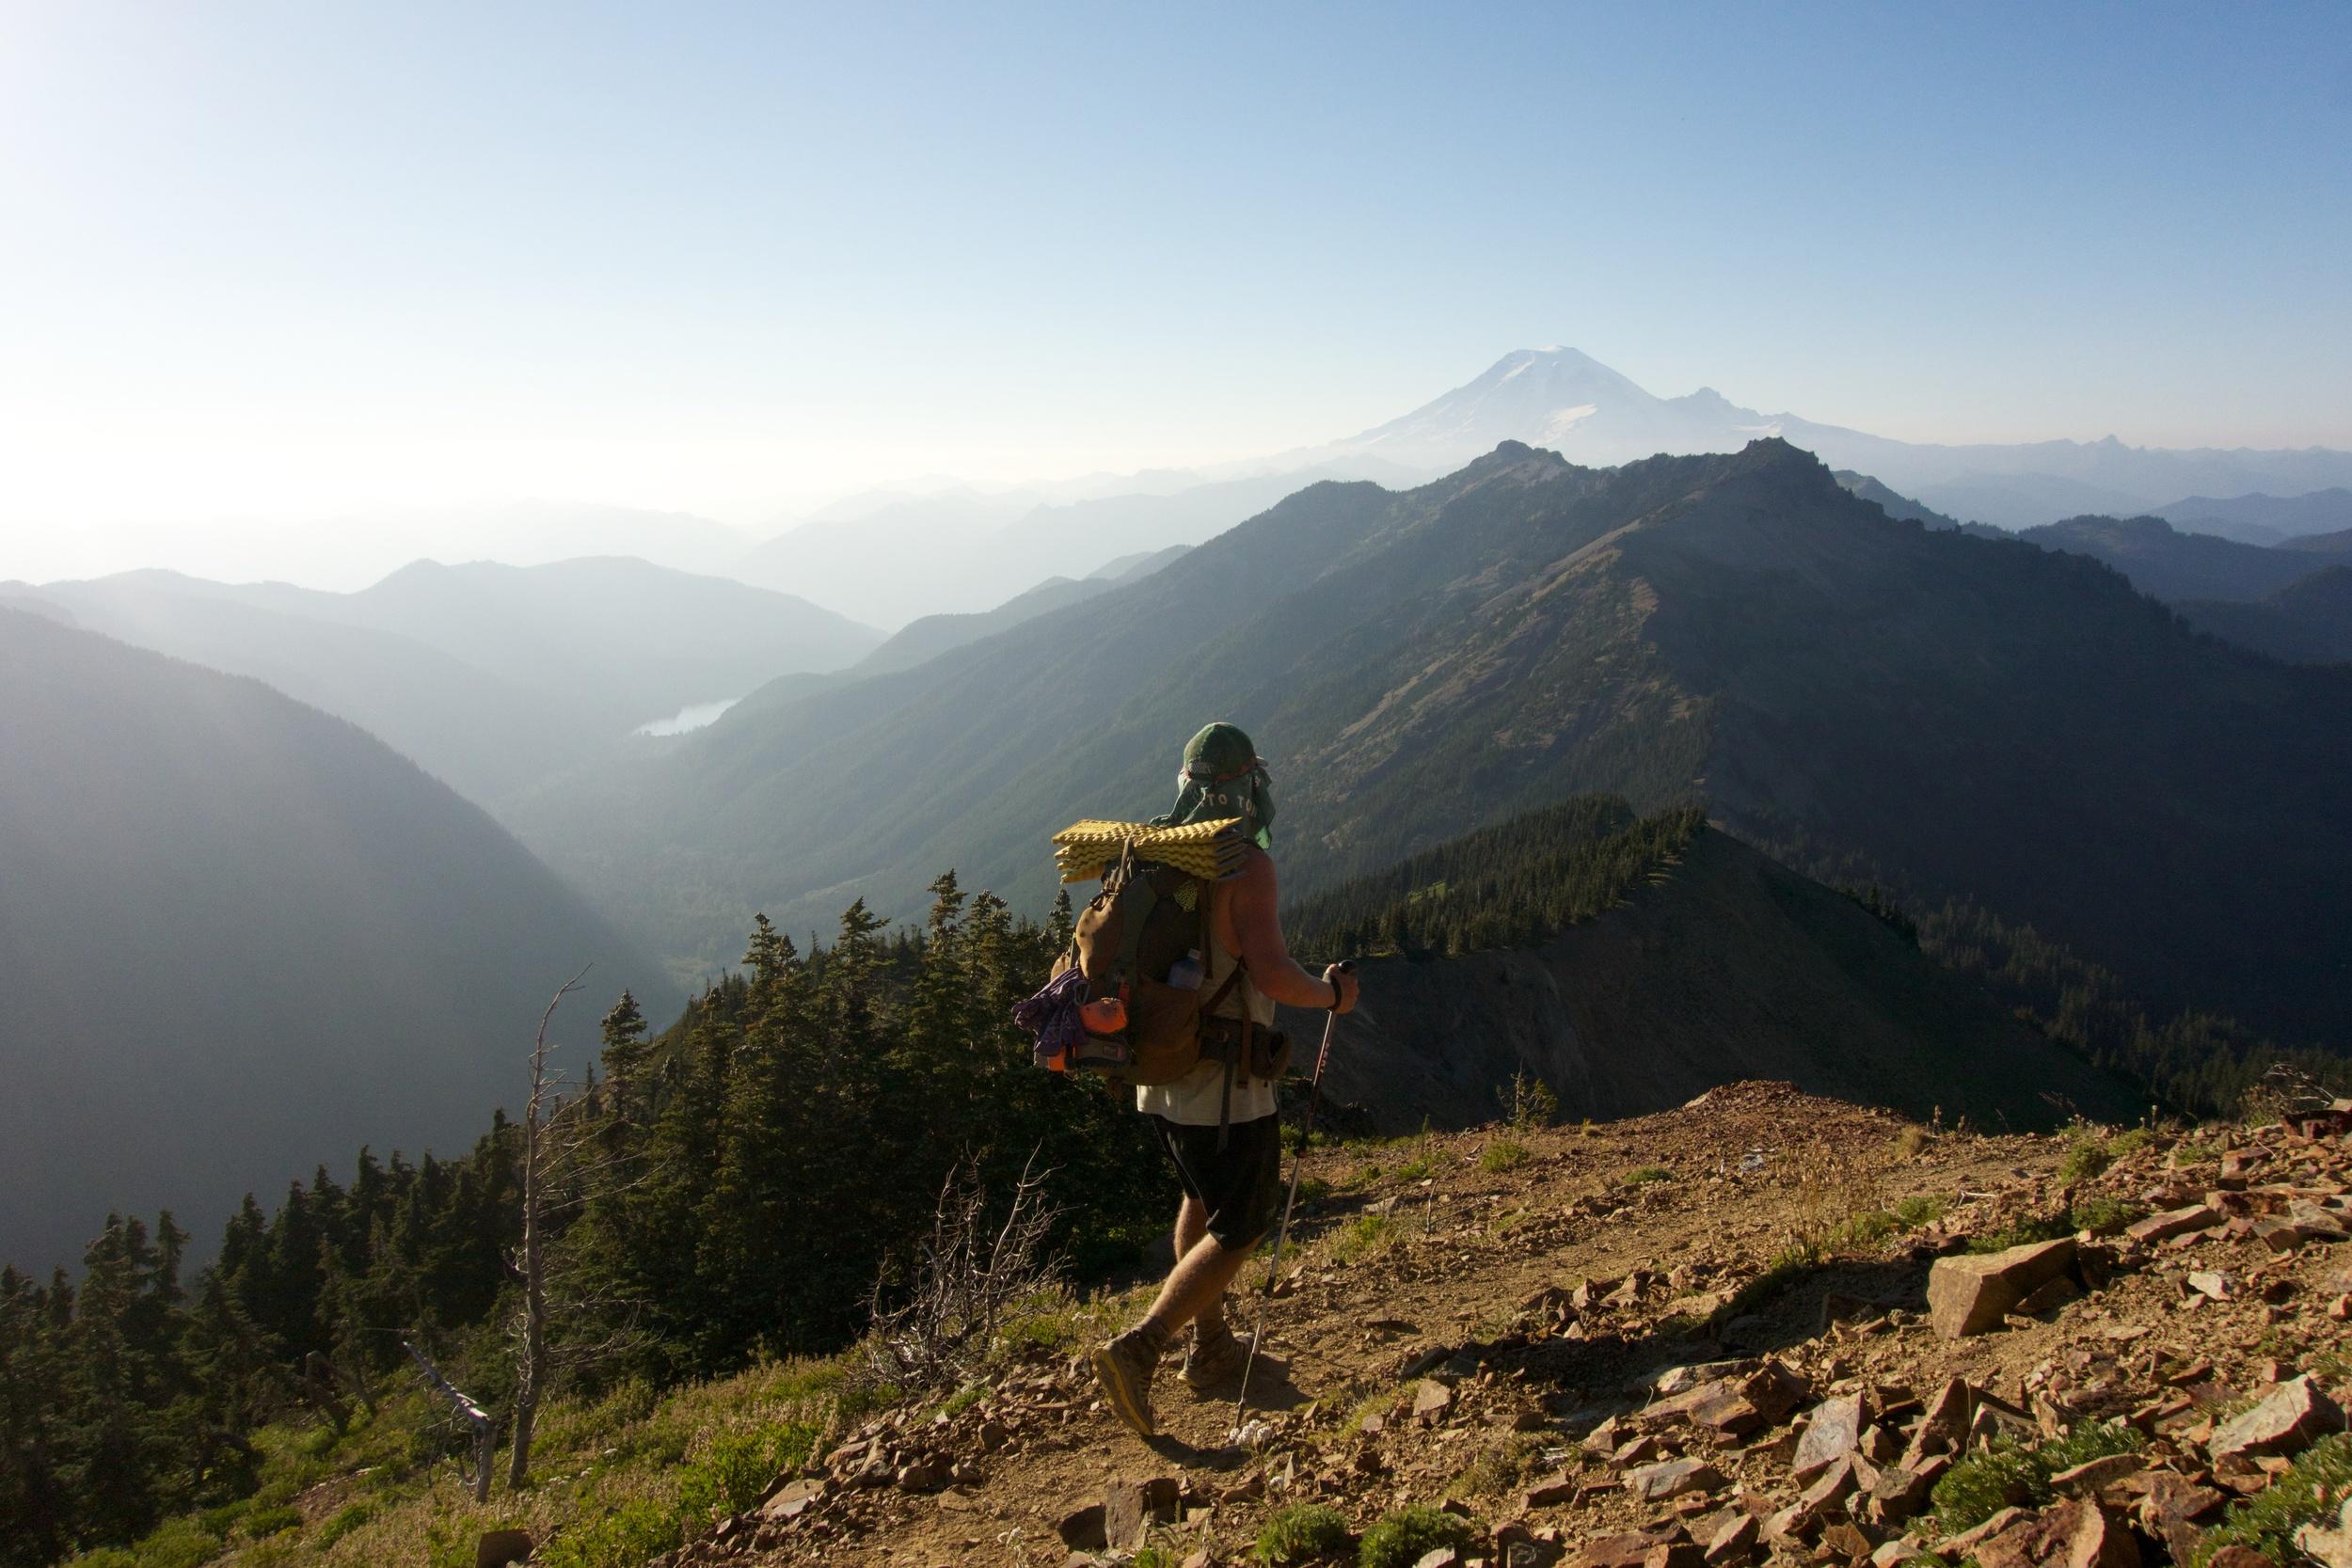 Goat Rocks and Rainier